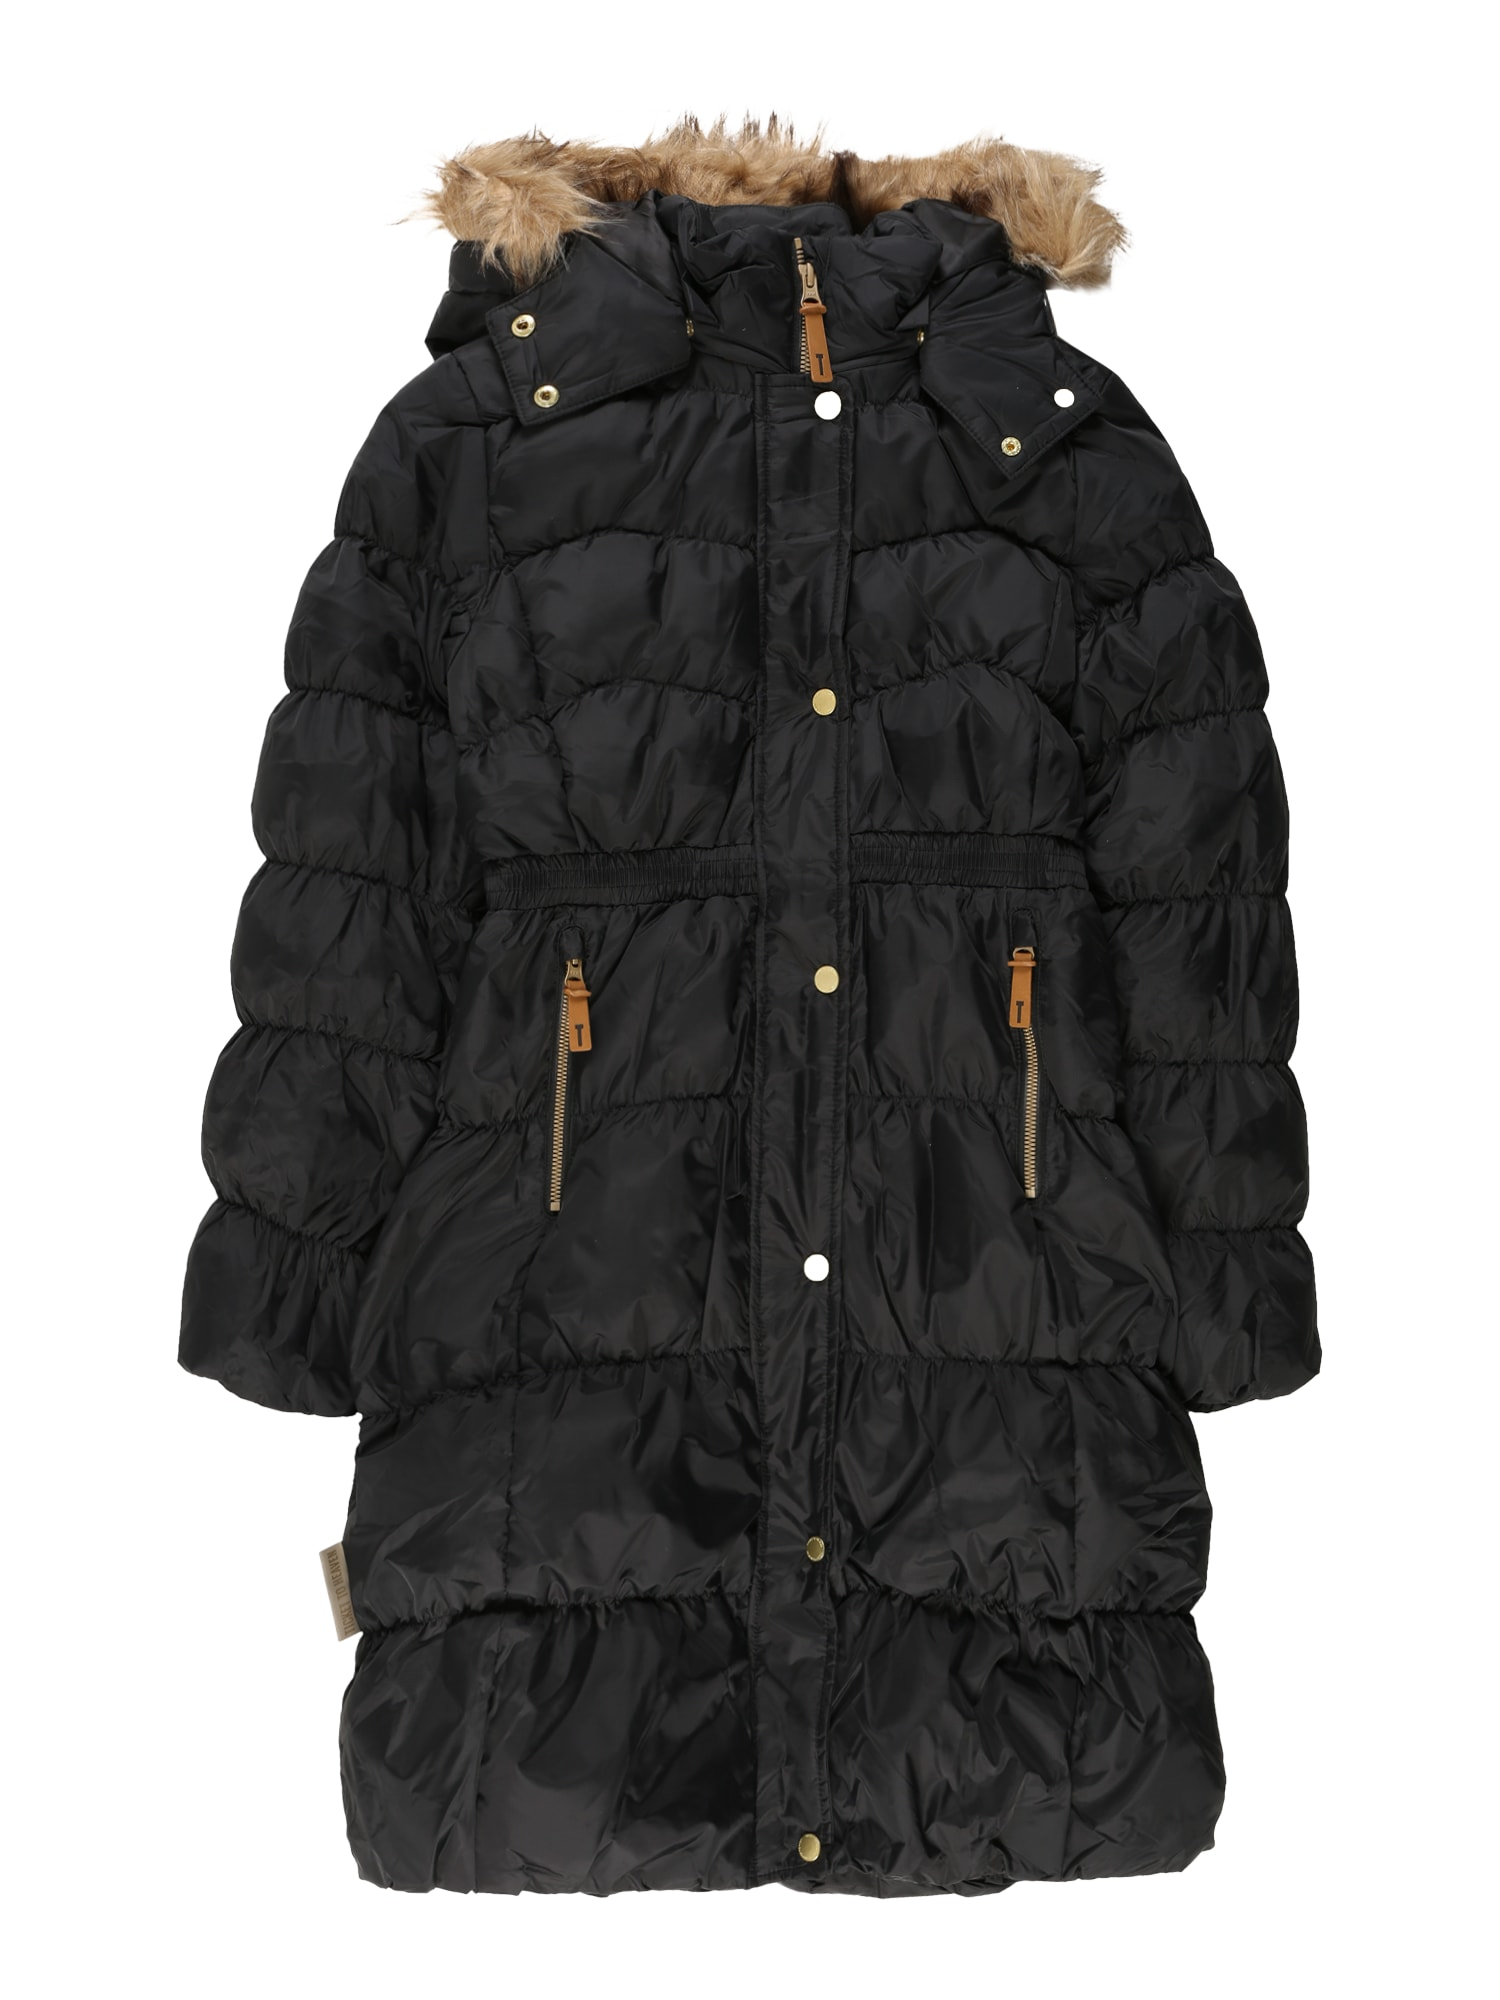 TICKET TO HEAVEN Paltas juoda